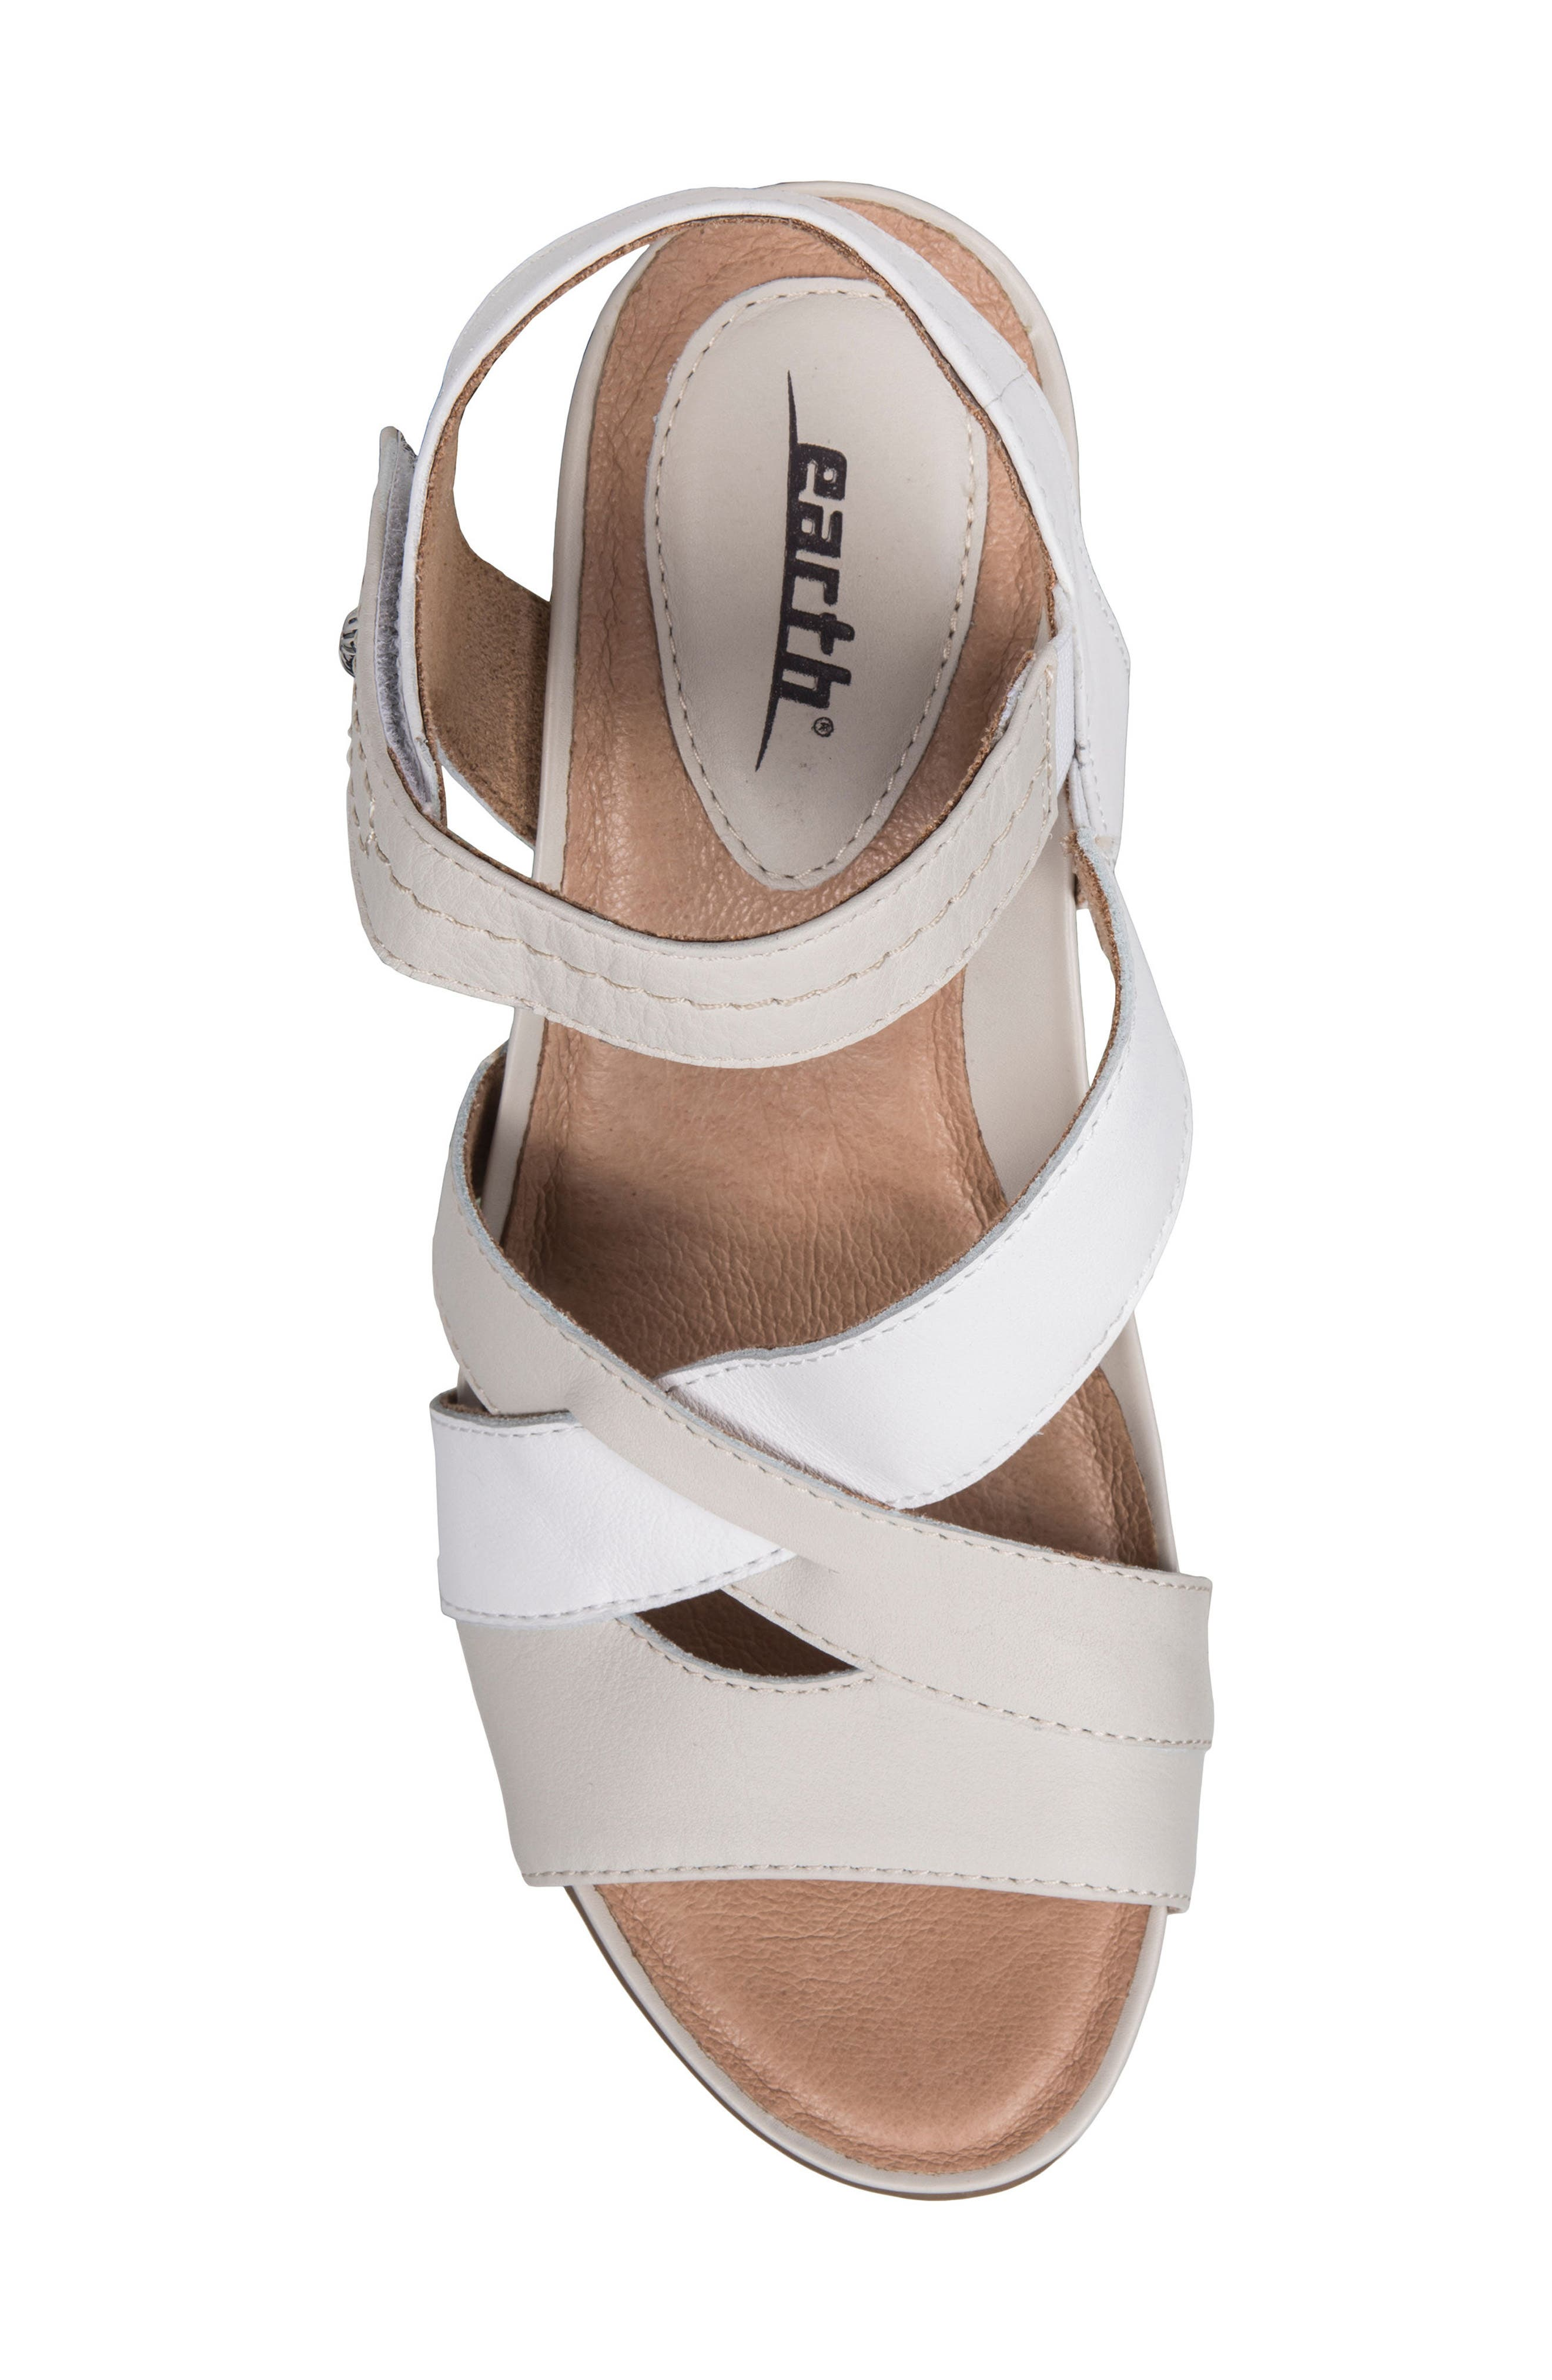 Thistle Wedge Sandal,                             Alternate thumbnail 18, color,